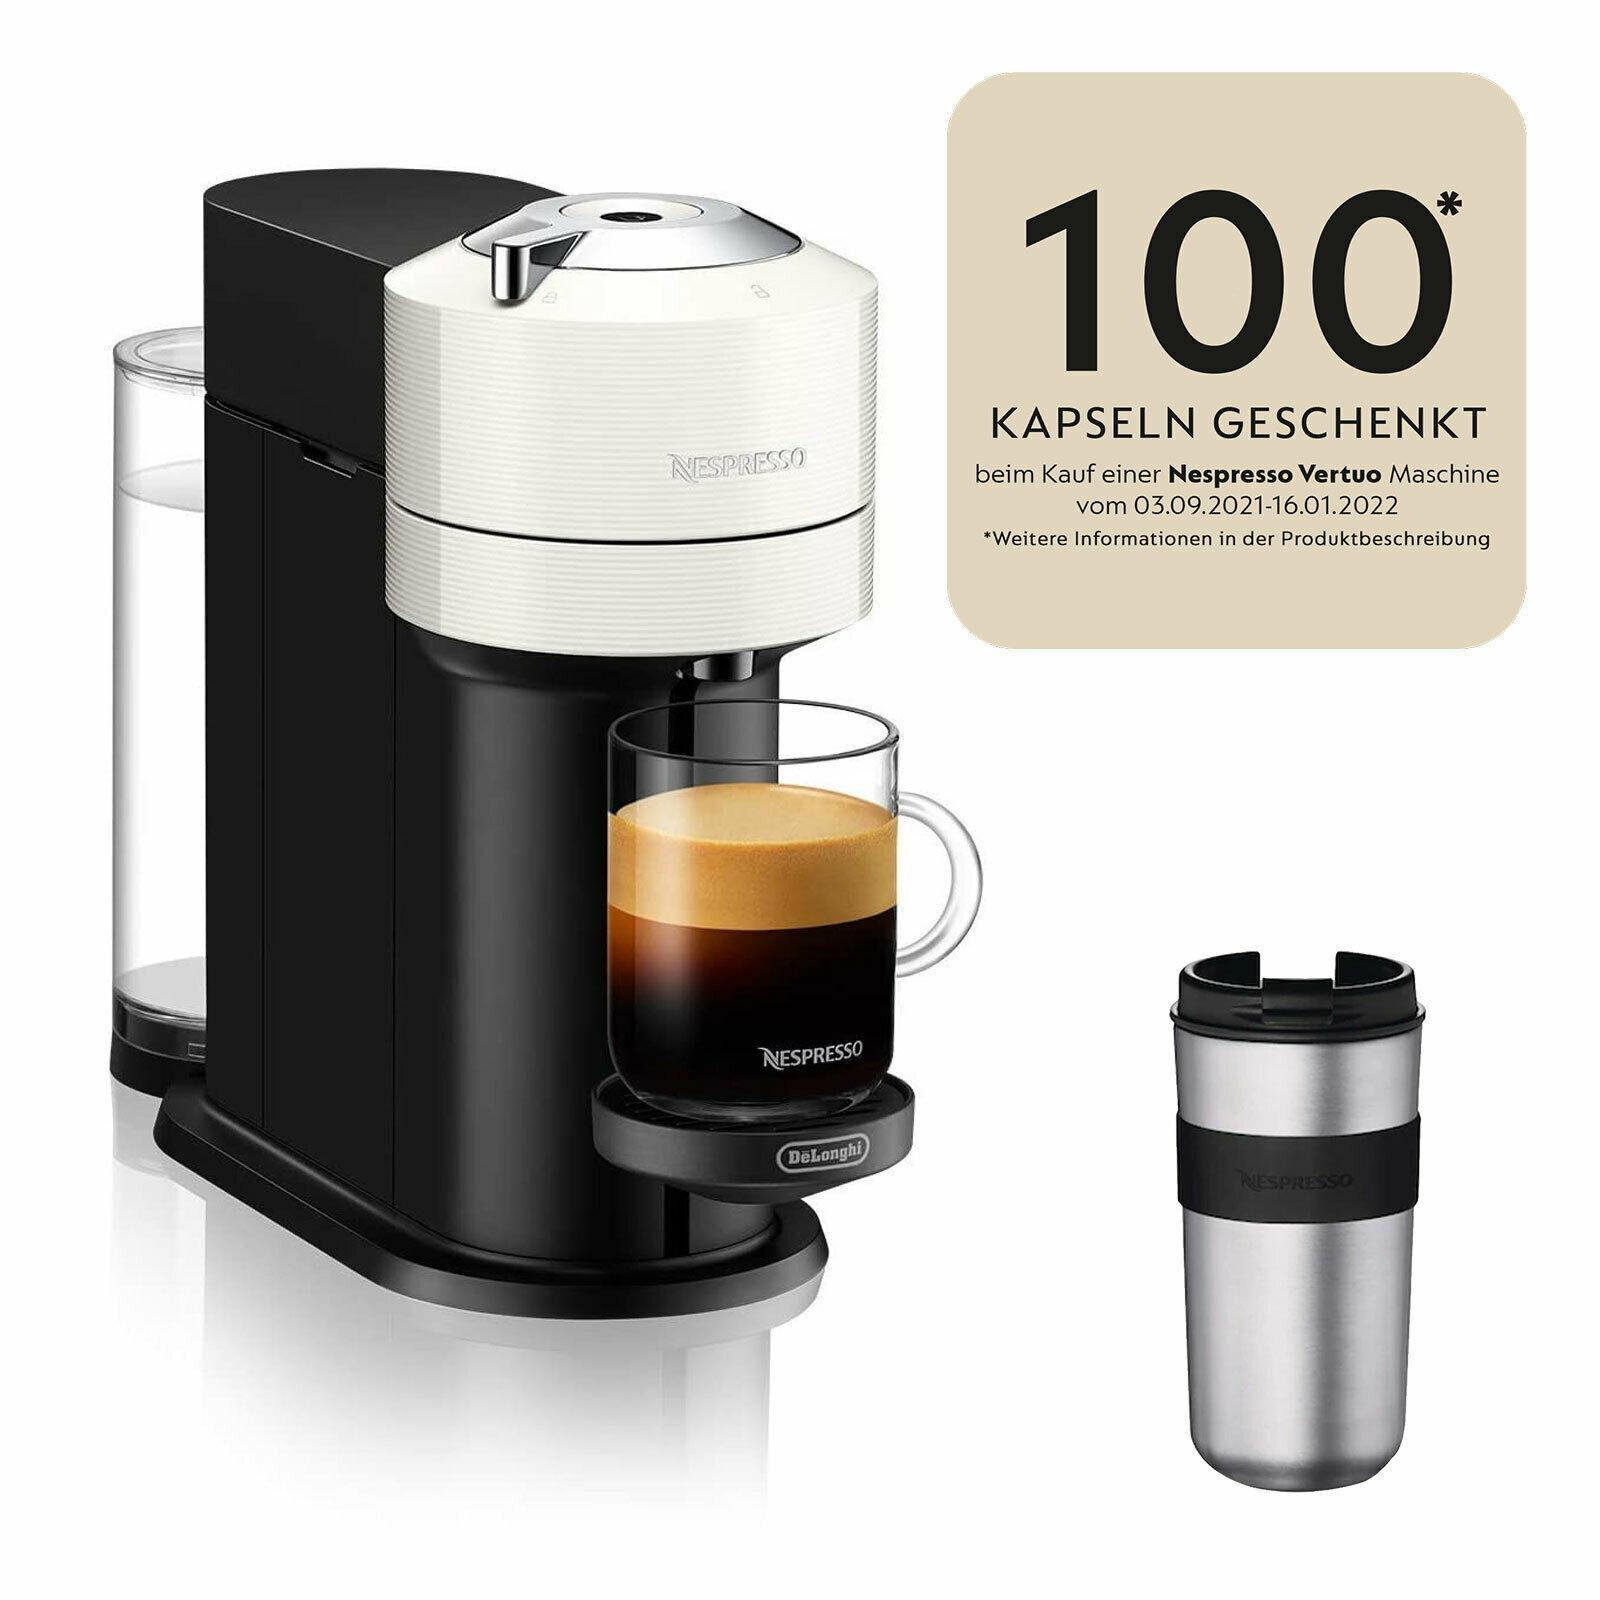 Bild zu Nespresso Kapselautomat DeLonghi ENV120.W Vertuo Next Basic + 100 Kapseln + Travel Mug 400ml für 41,93€ (Vergleich: 54,99€)